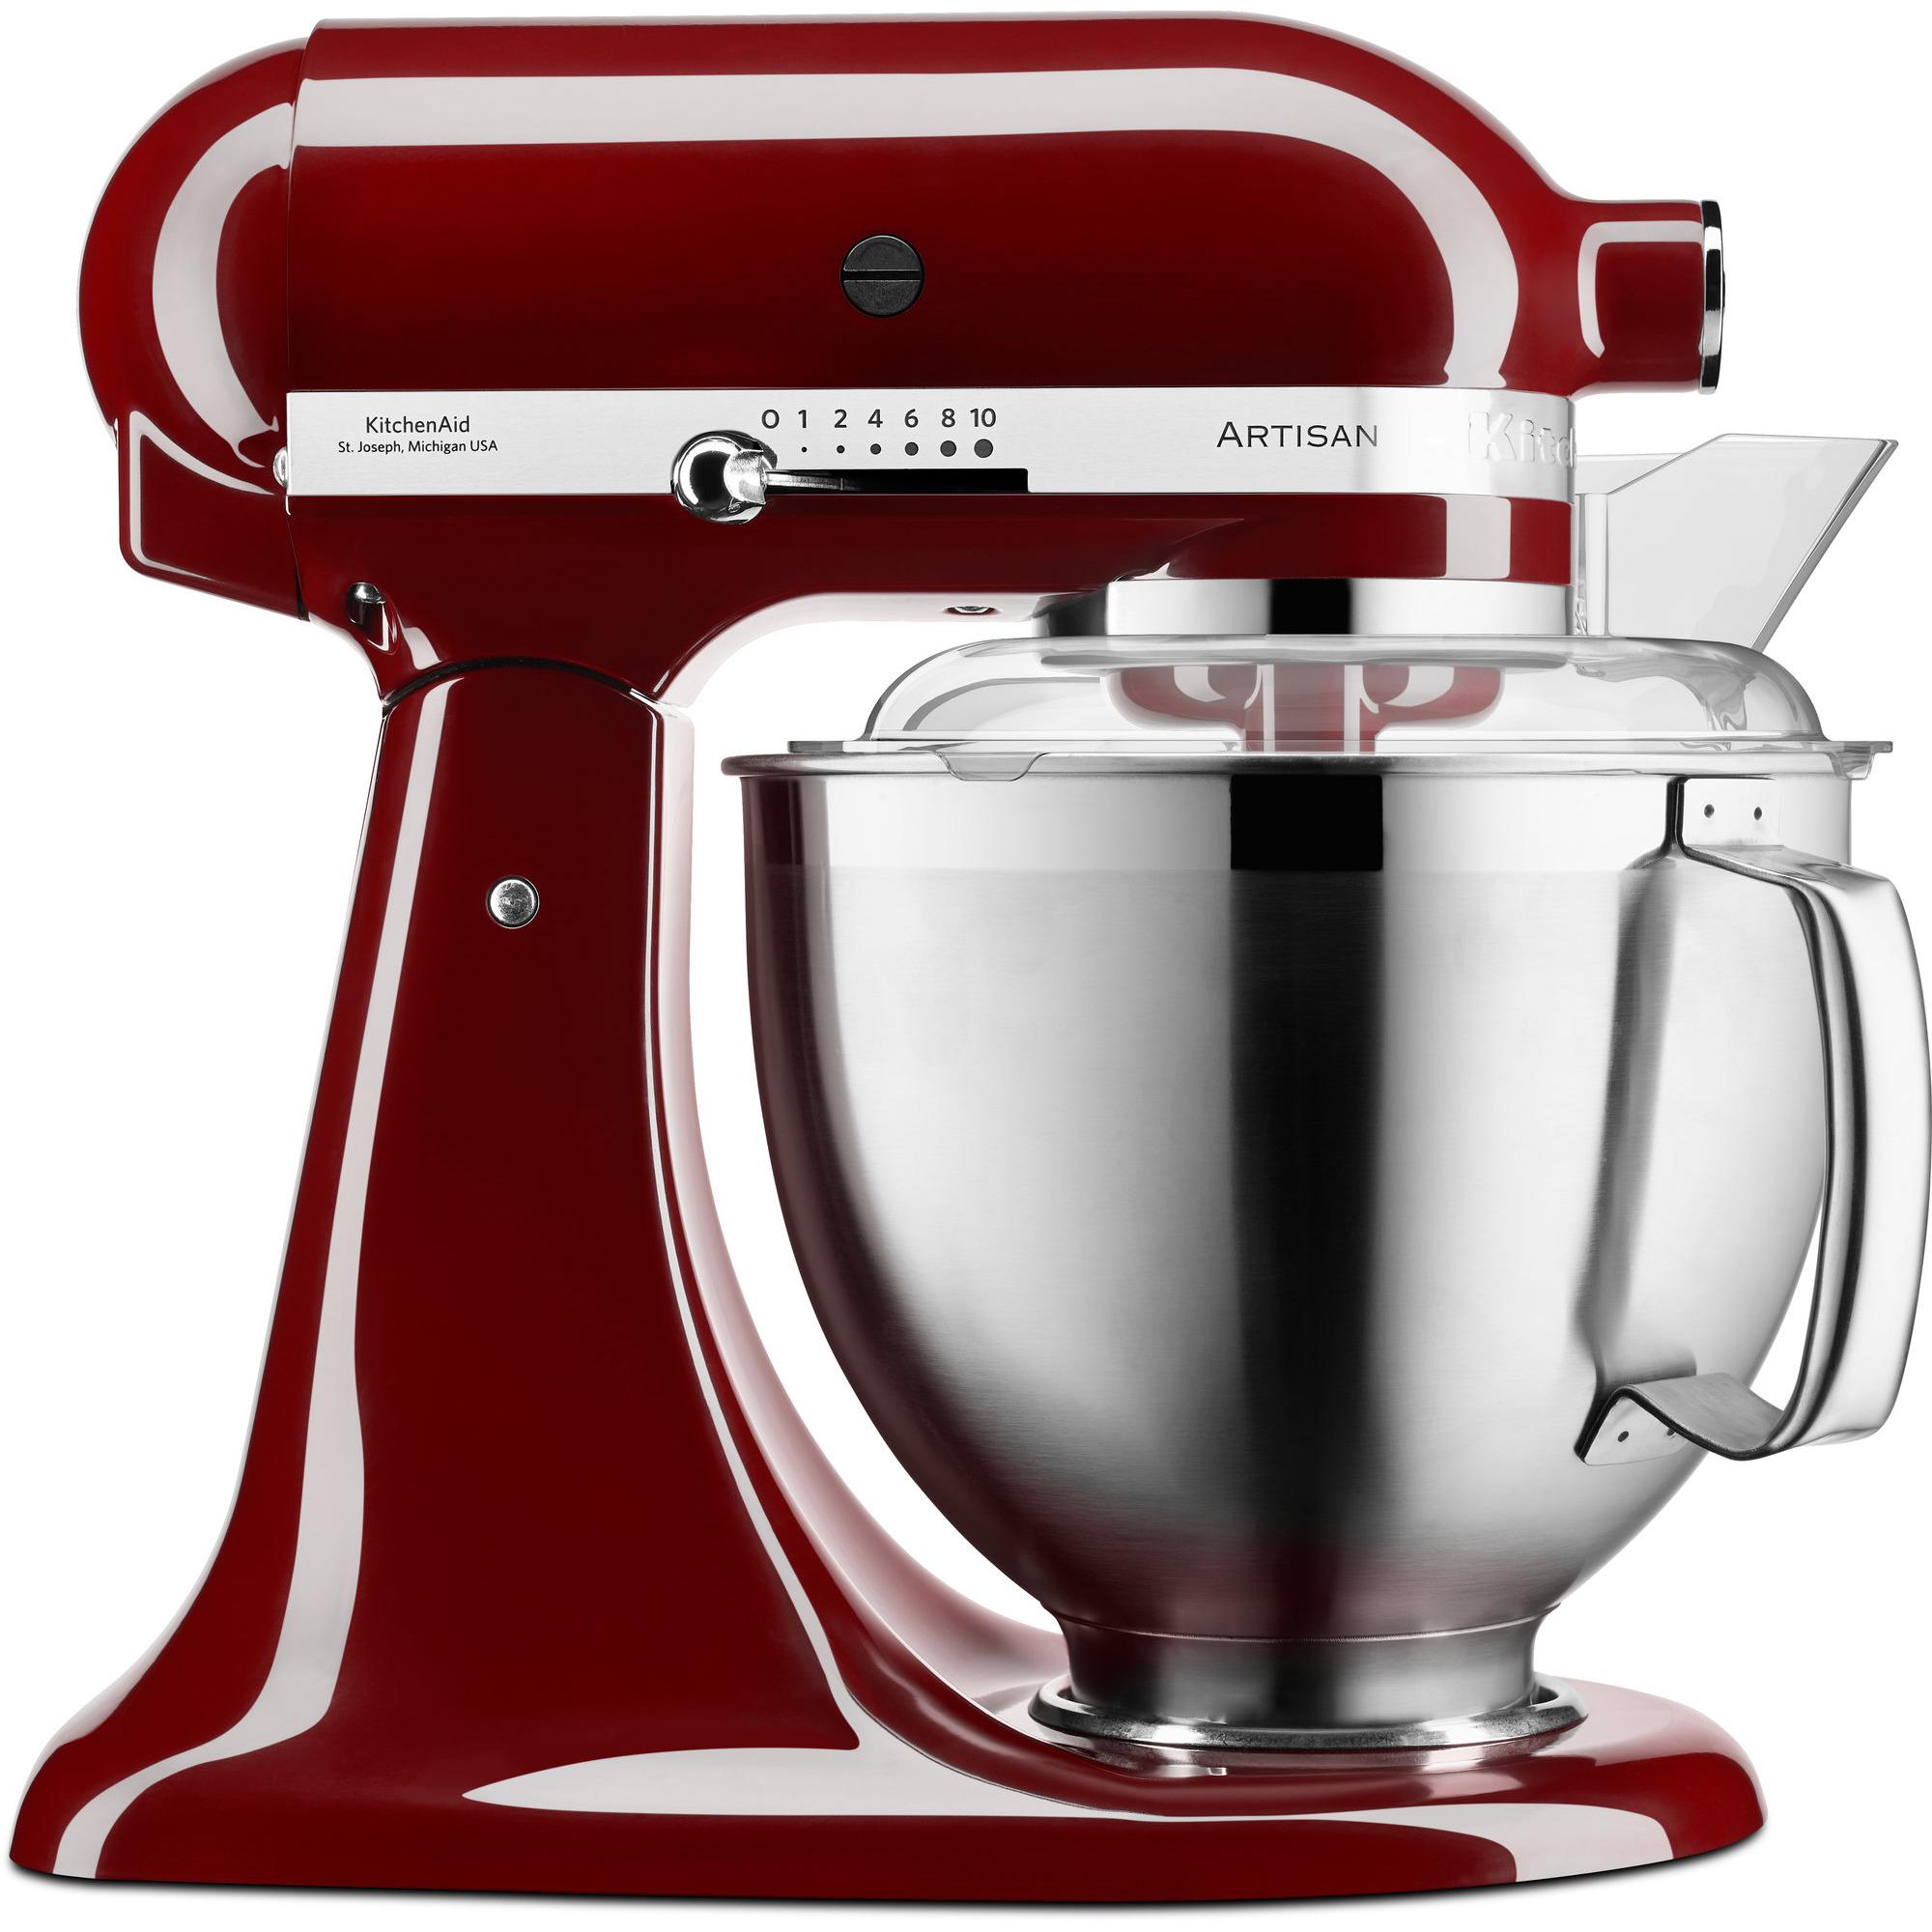 KitchenAid Artisan 5KSM185PSECM Stand Mixer 48LPurpurrot